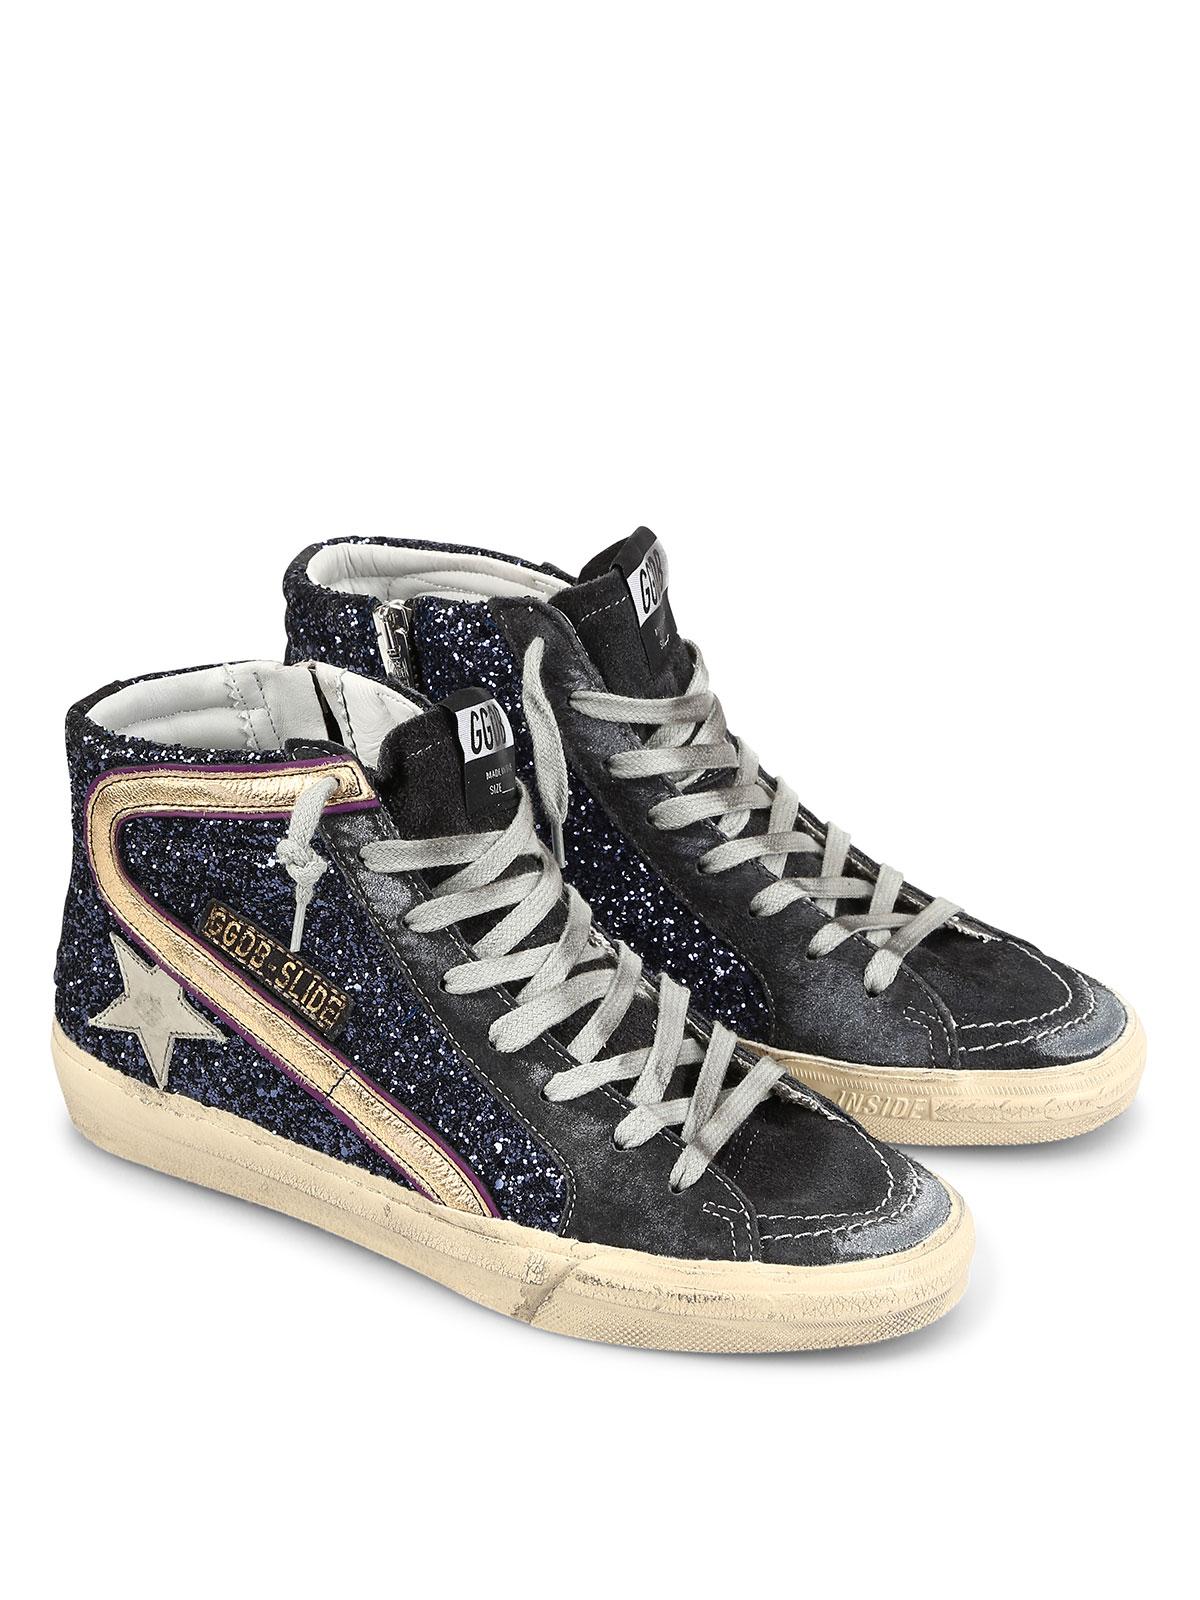 slide sneakers by golden goose trainers shop online at. Black Bedroom Furniture Sets. Home Design Ideas